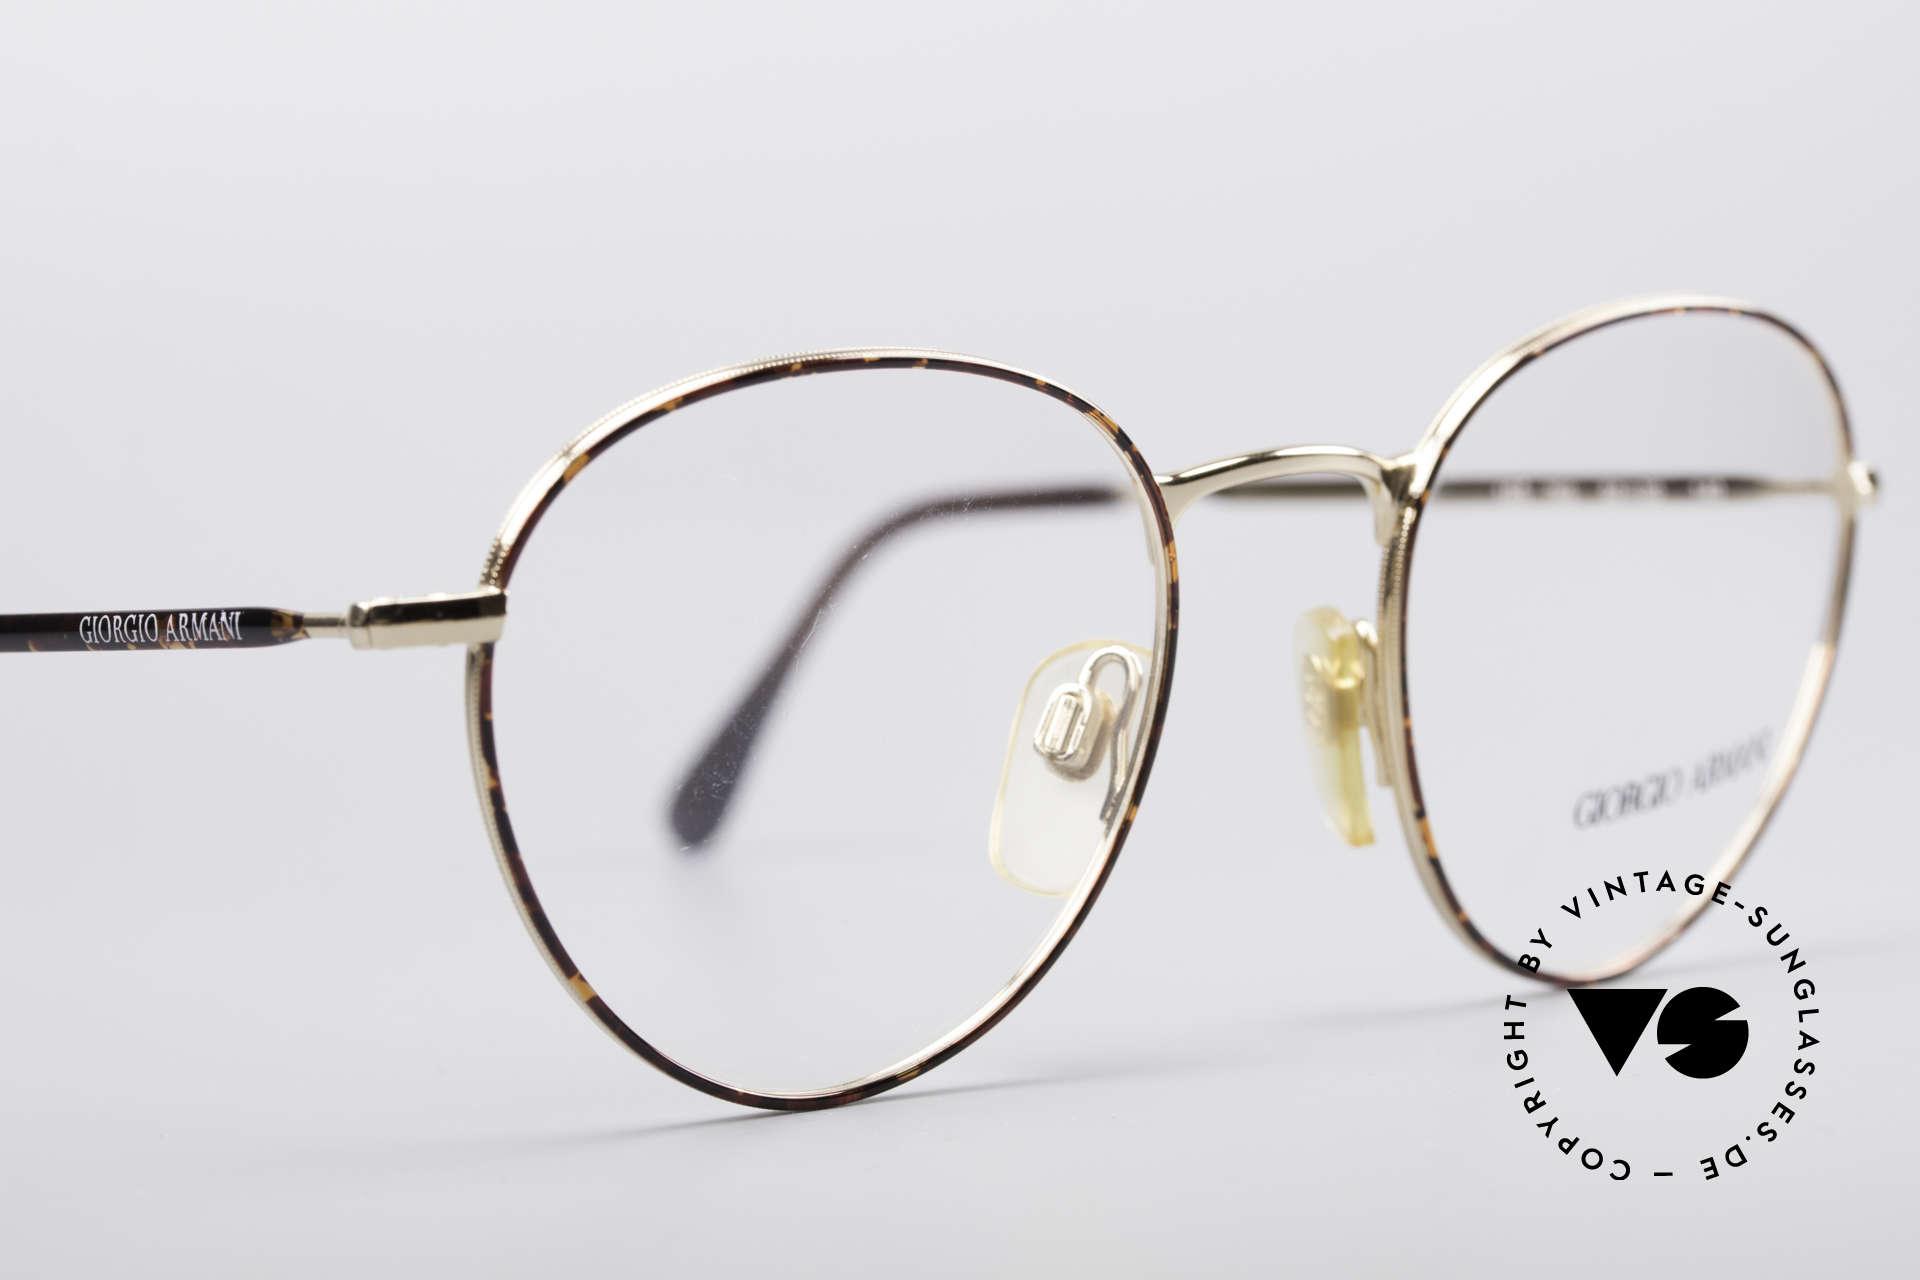 Giorgio Armani 165 Panto Vintage Glasses, unworn (like all our vintage GIORGIO Armani frames), Made for Men